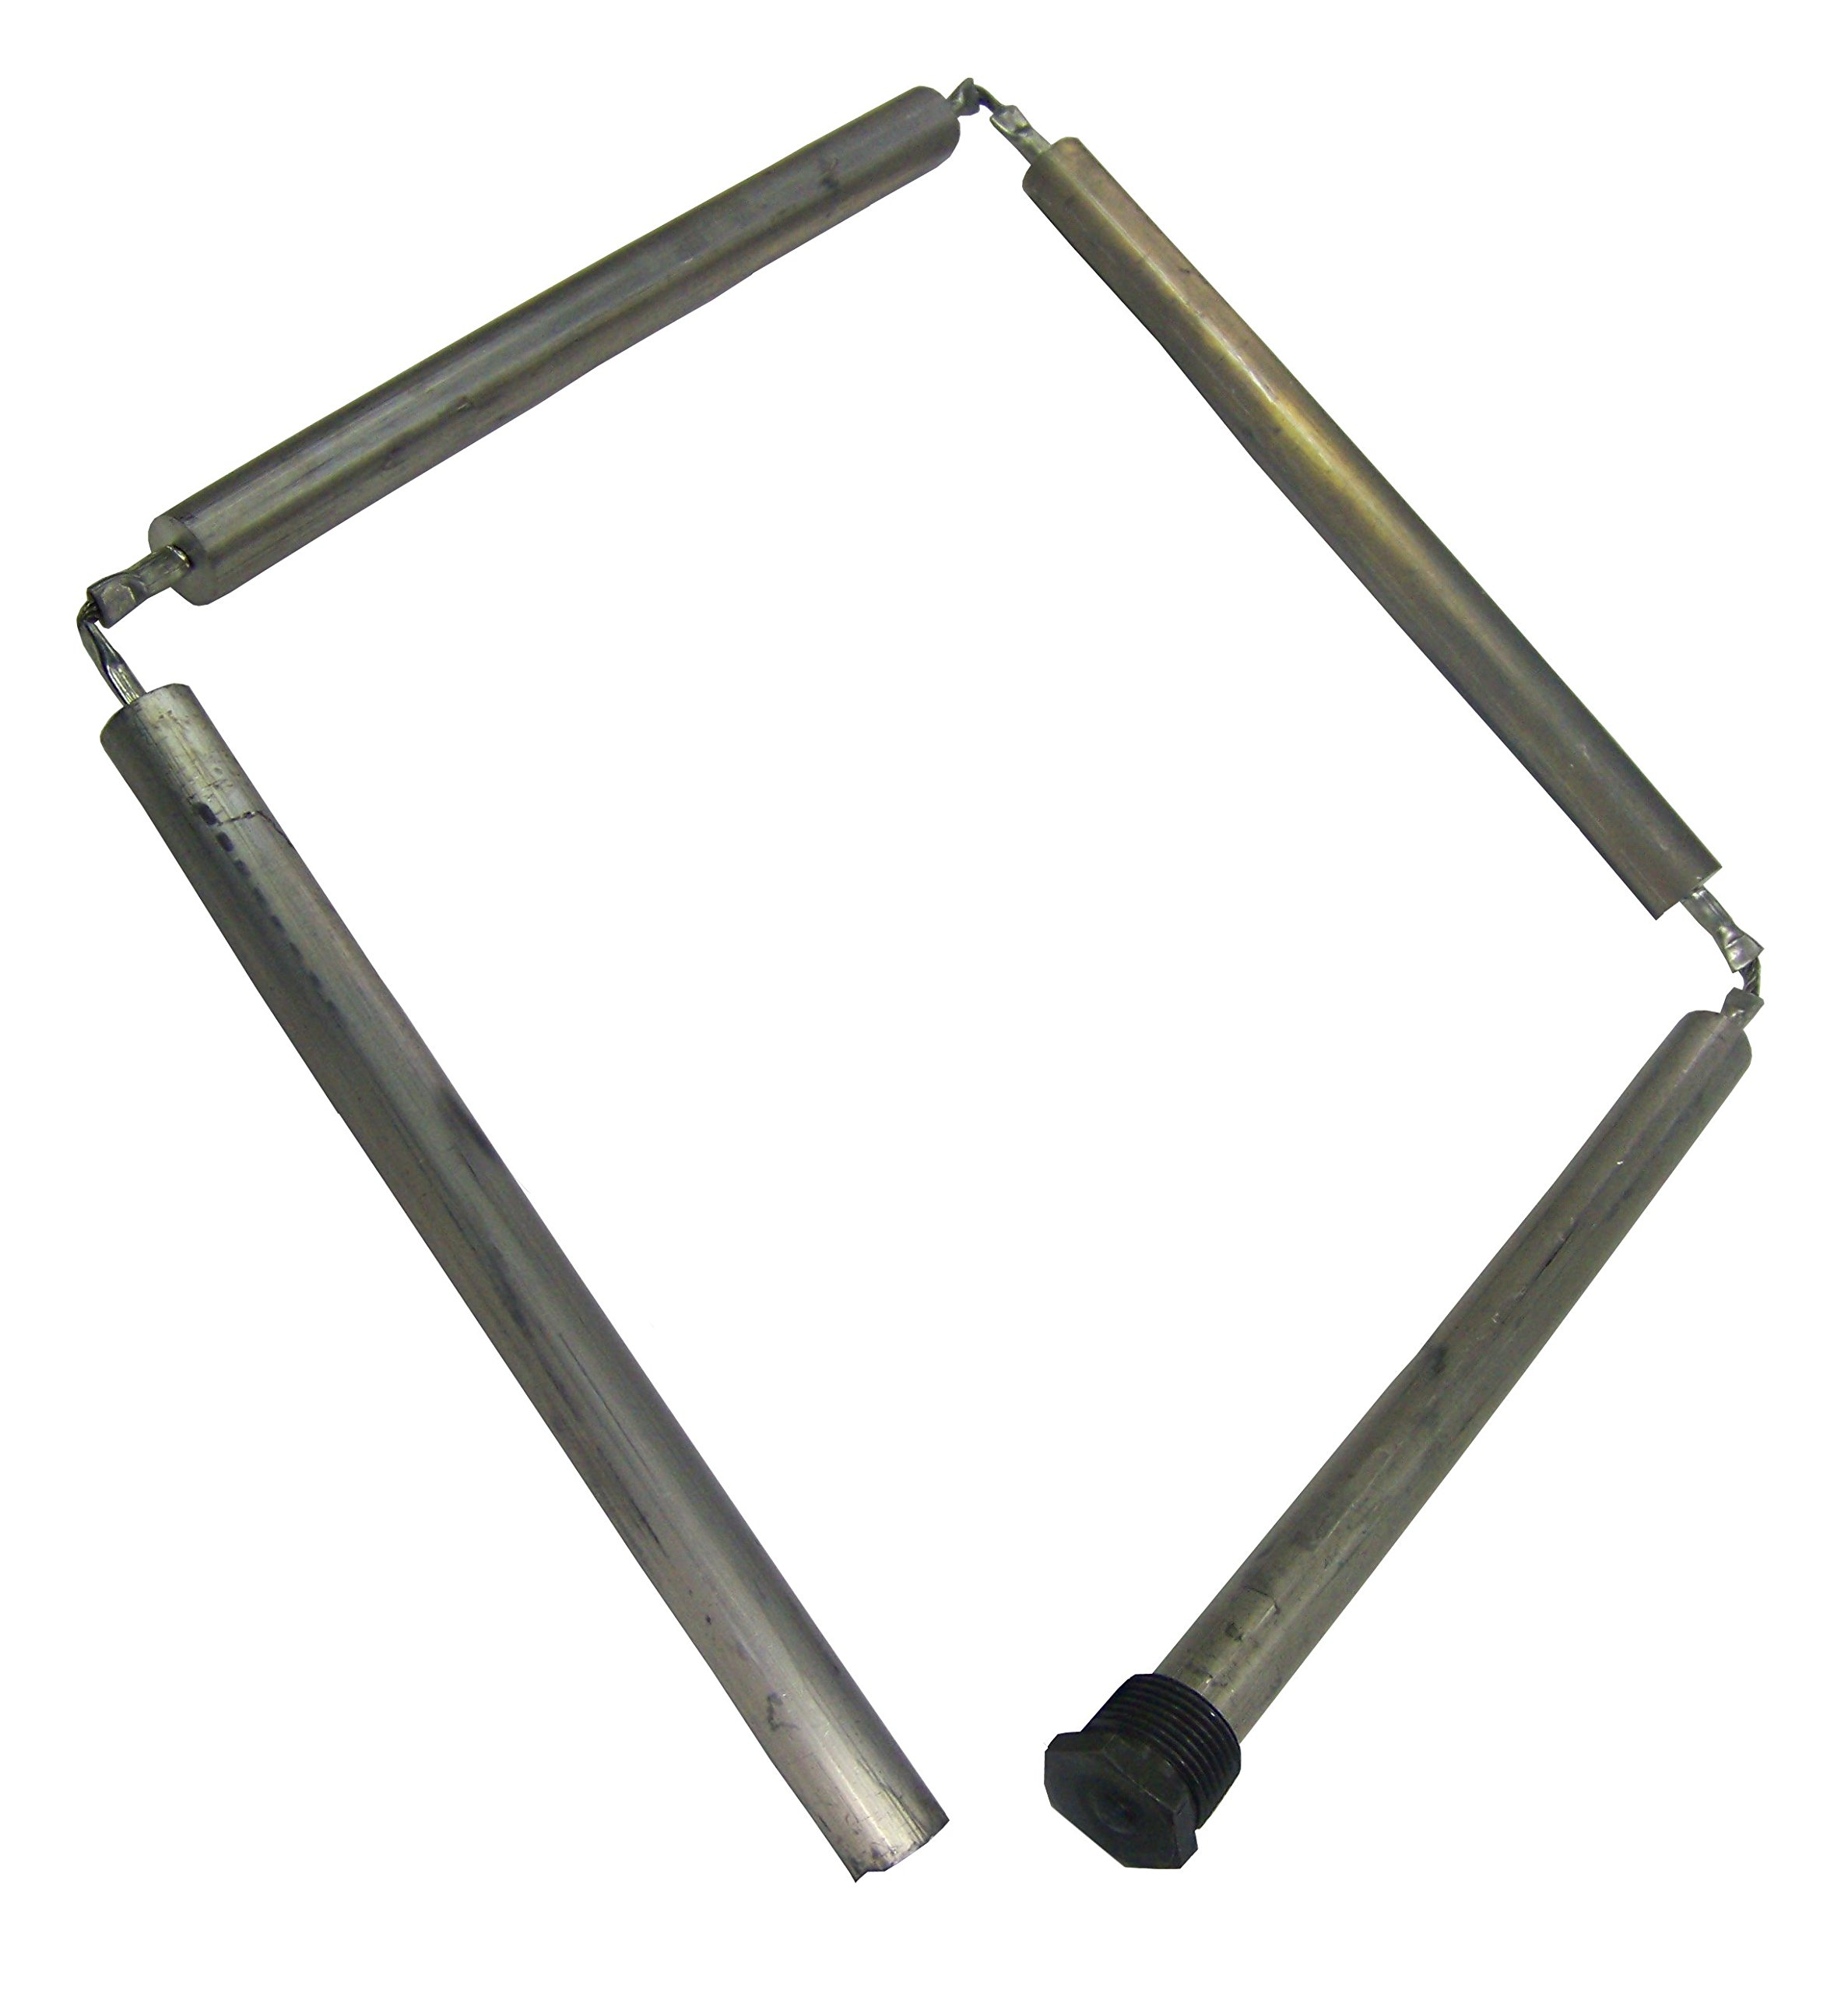 Blue Lightning 79098 Residental Magnesium Flexible Anode Rod, Hex Plug, 44-Inch